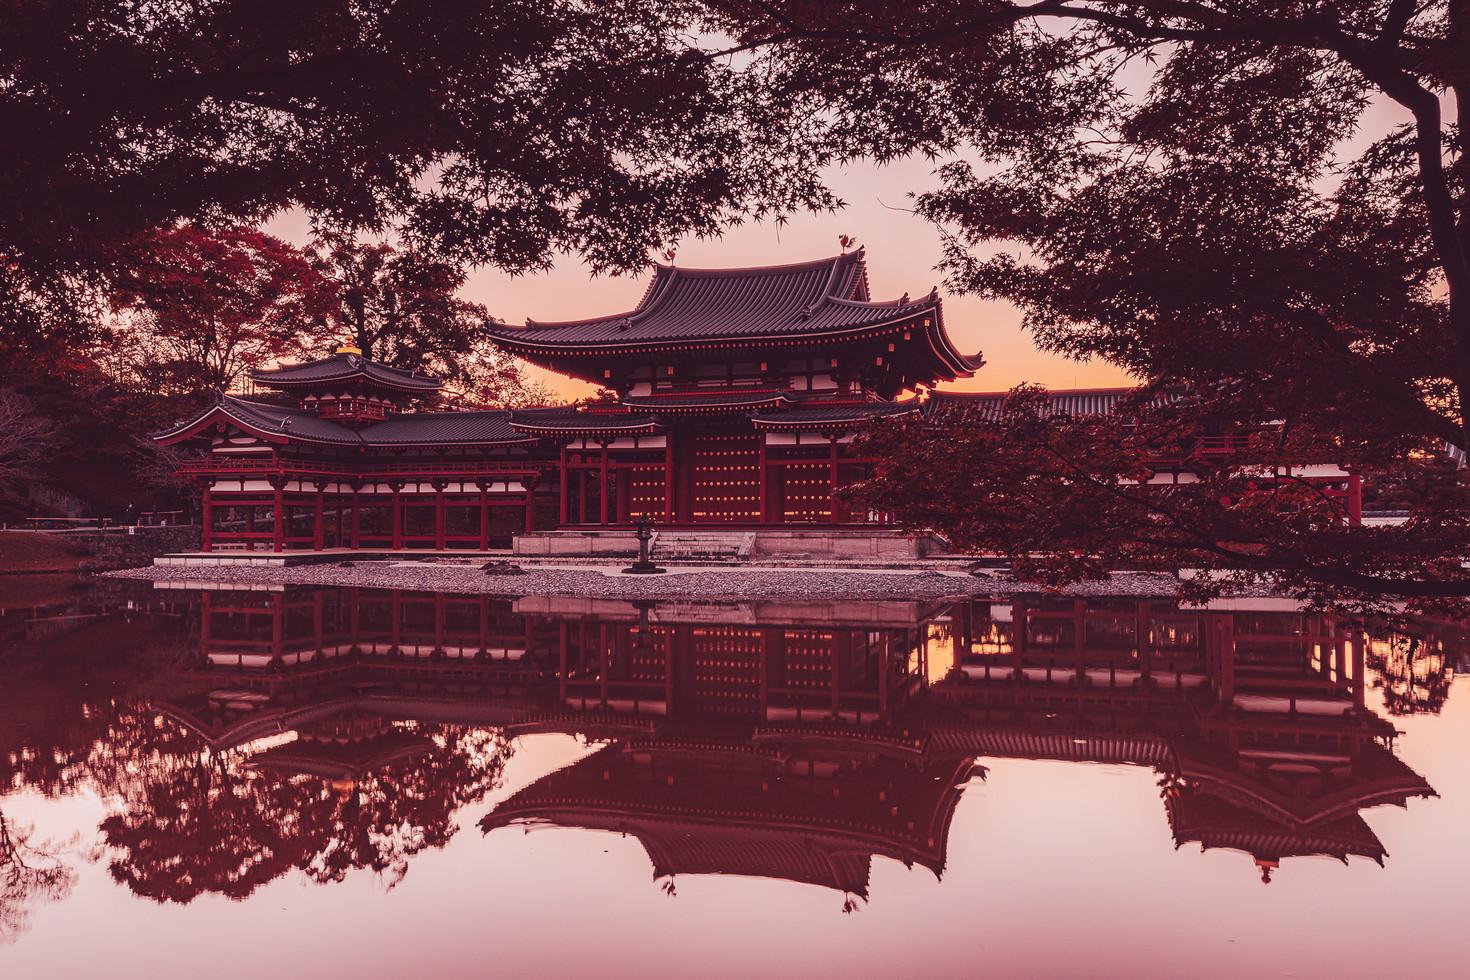 TKPA-Kyoto201911-0117-HDWH.jpg